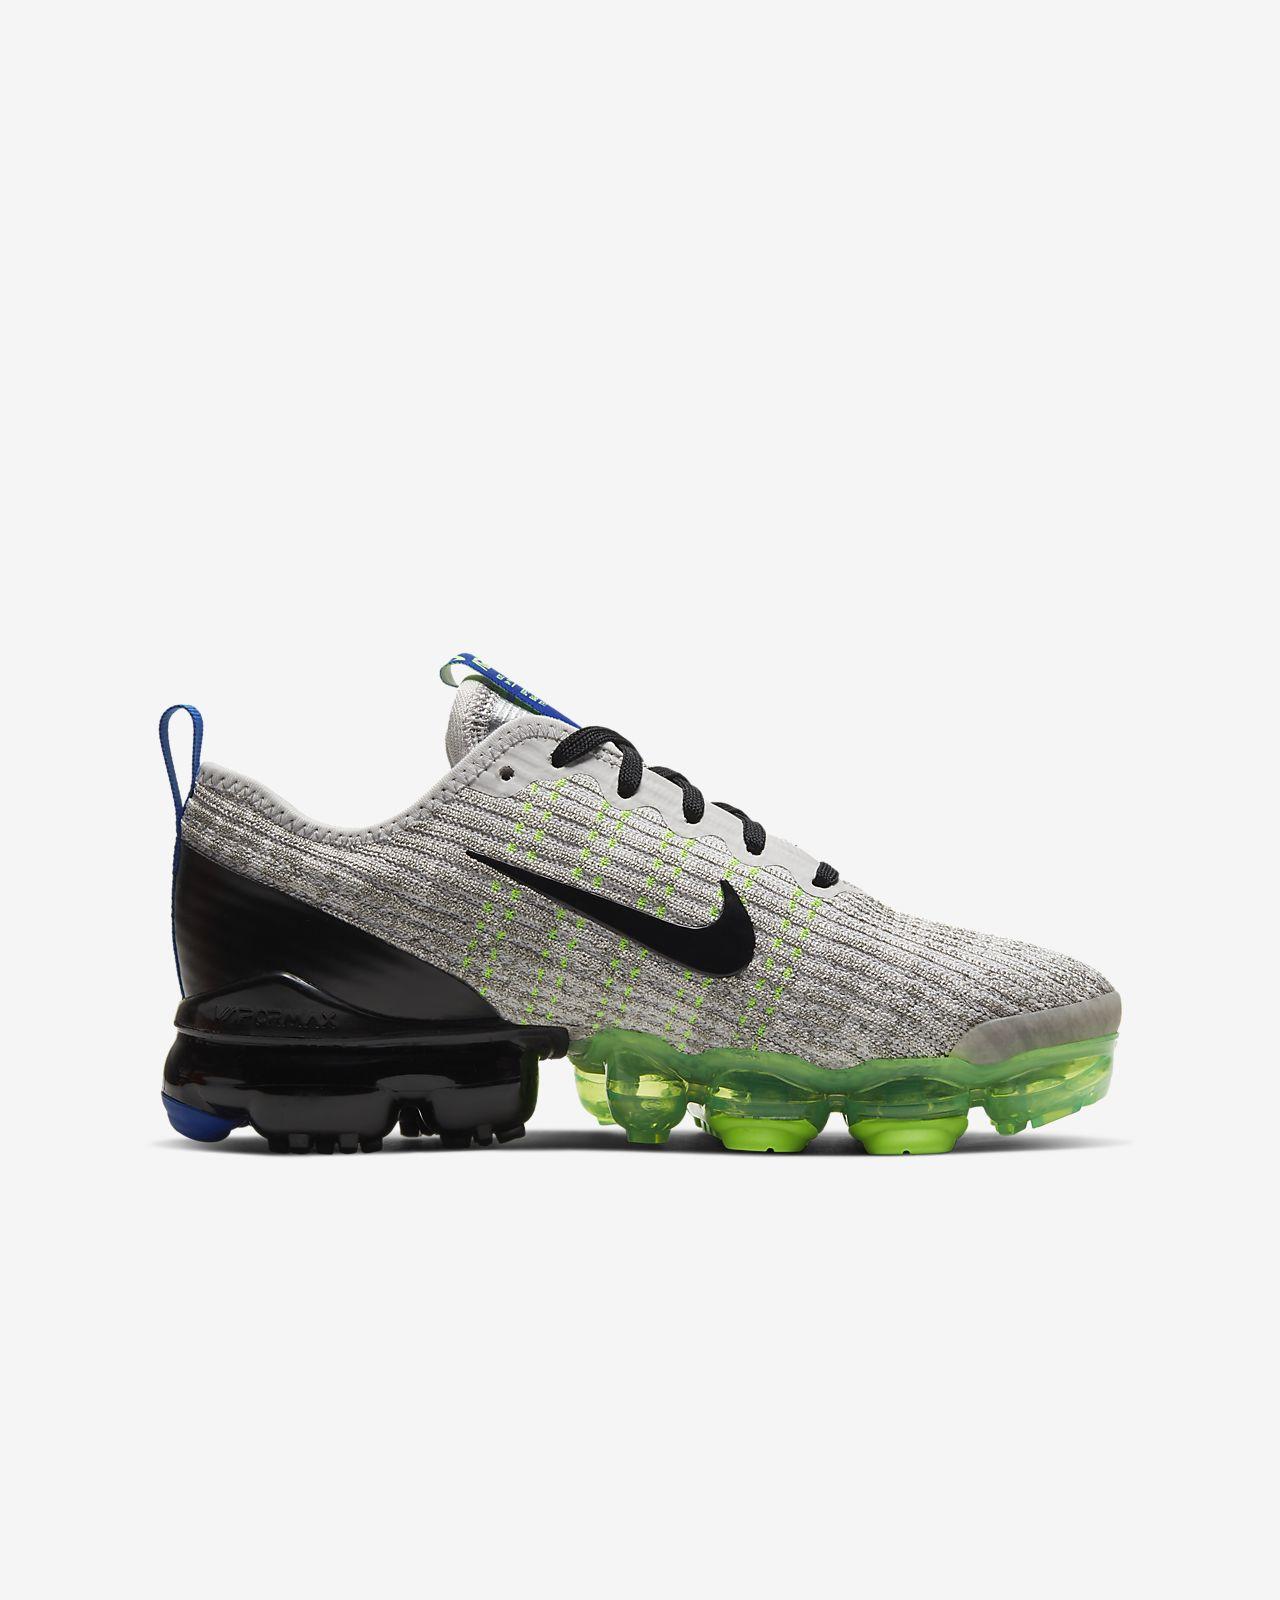 17 Best I ❤Nike images | Nike, Nike outfits, Nike free shoes